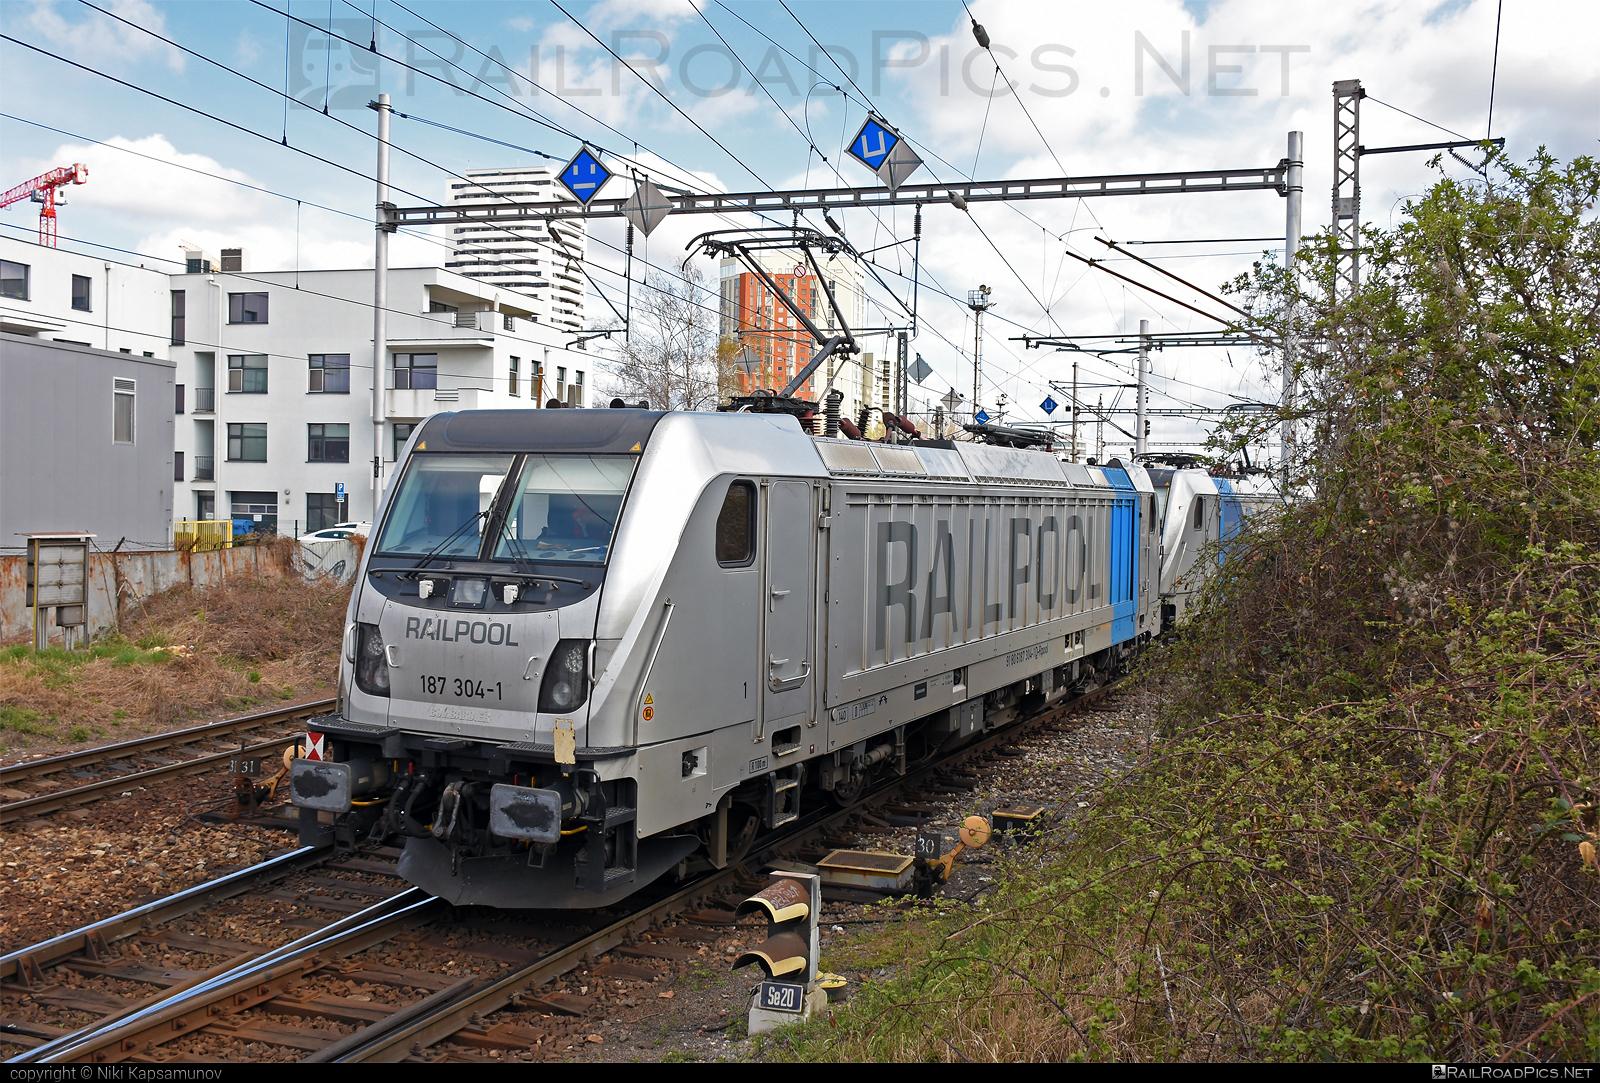 Bombardier TRAXX F160 AC3 - 187 304-1 operated by ČD Cargo, a.s. #bombardier #bombardiertraxx #cdcargo #cdcargoniederlassungwien #railpool #railpoolgmbh #traxx #traxxf160 #traxxf160ac #traxxf160ac3